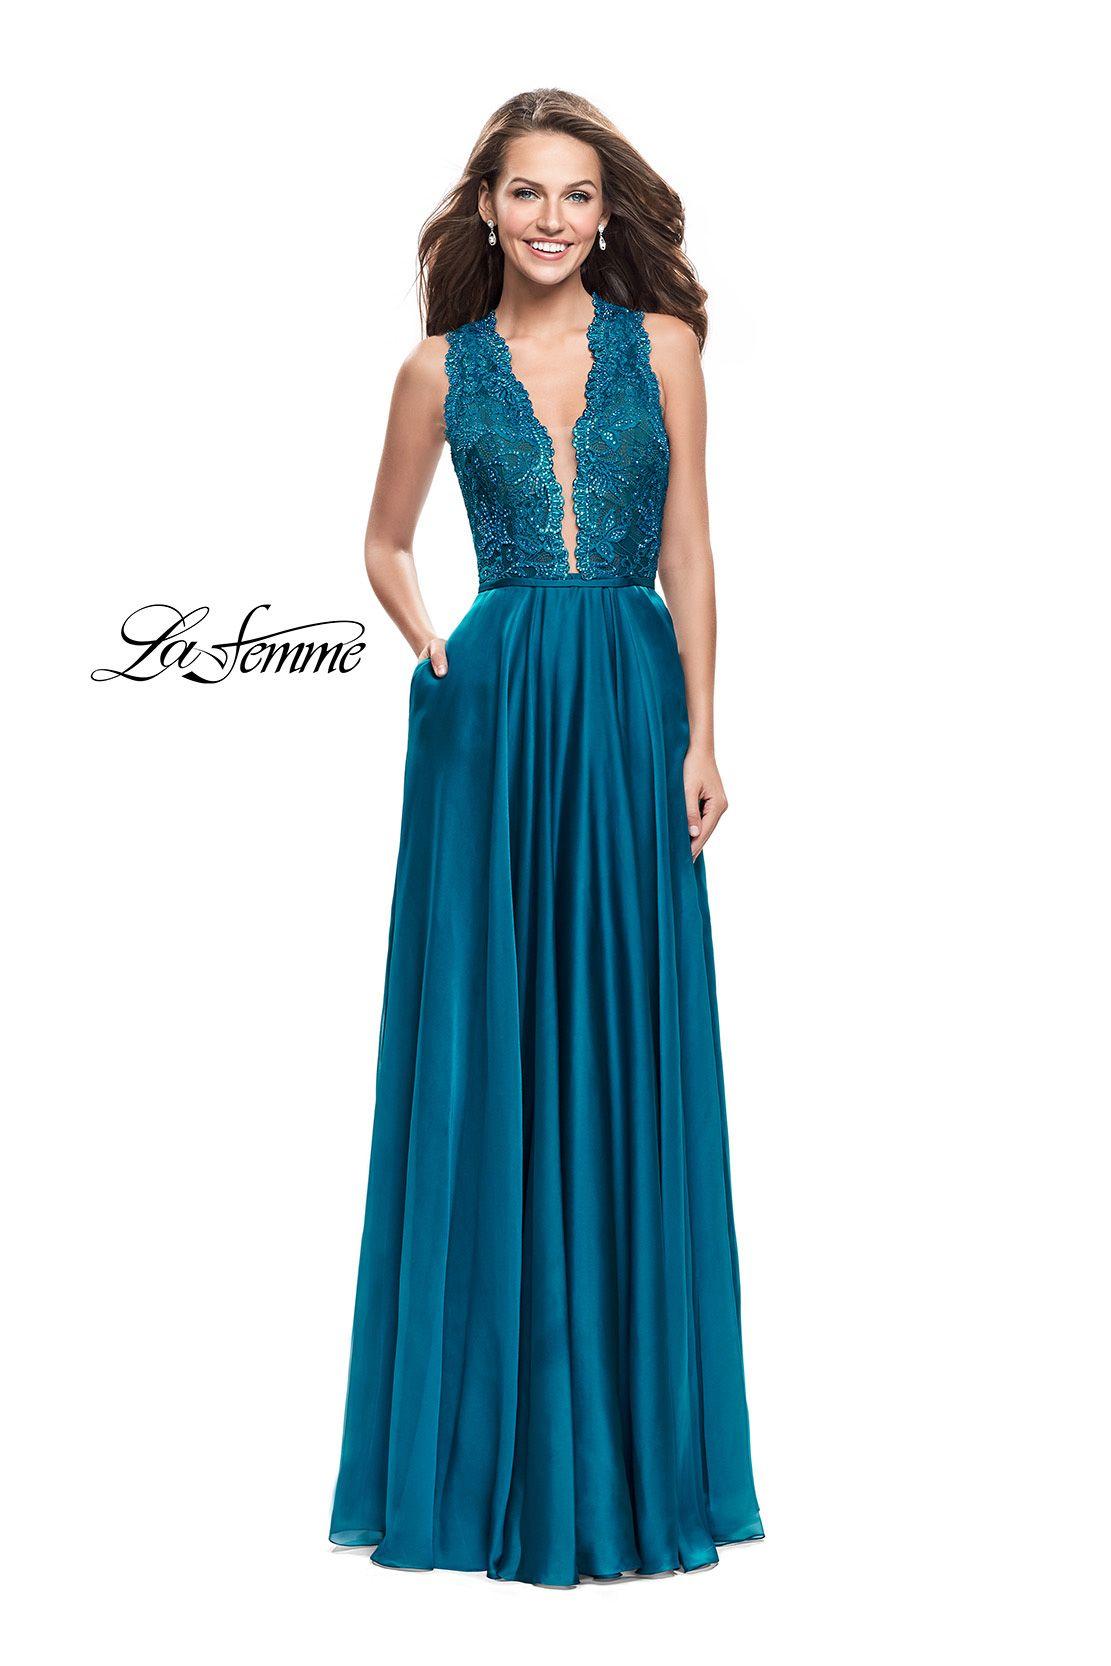 La Femme 25487 - International Prom Association Dresses #promdress ...